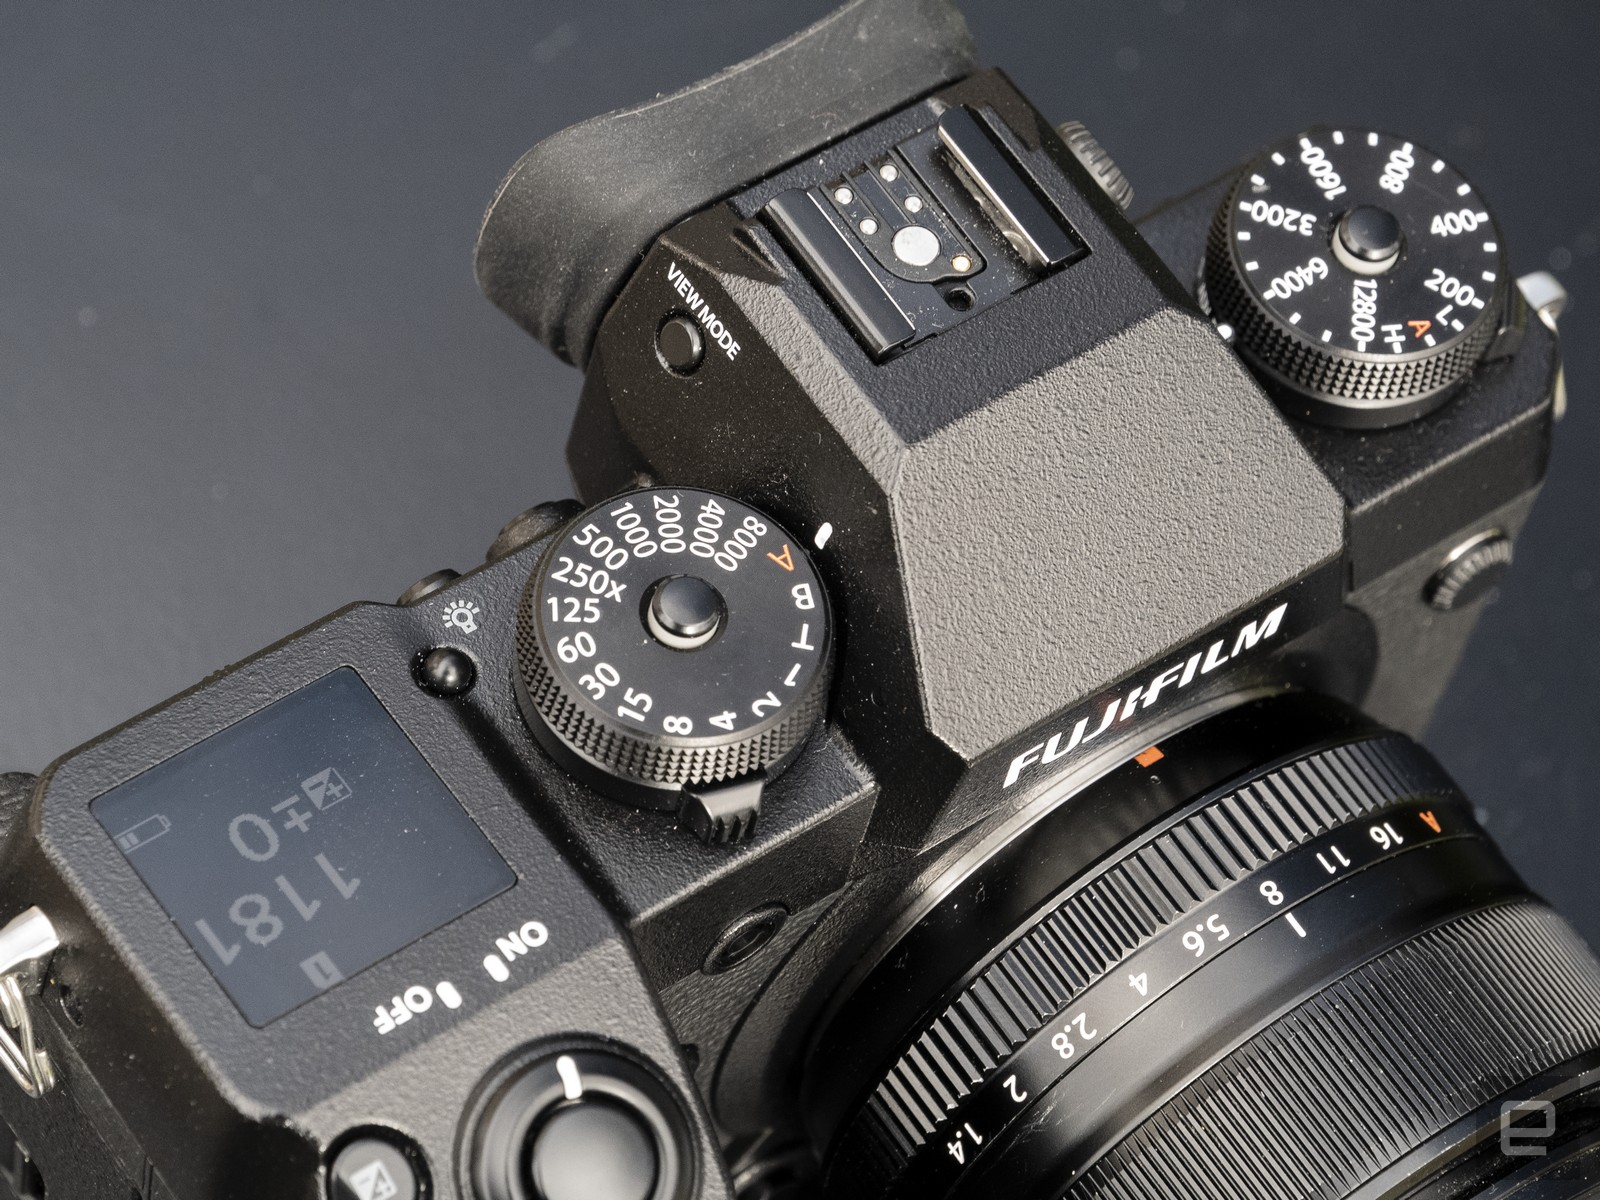 Fujifilm X-H1 review: Beautiful photos, but lacking X-series